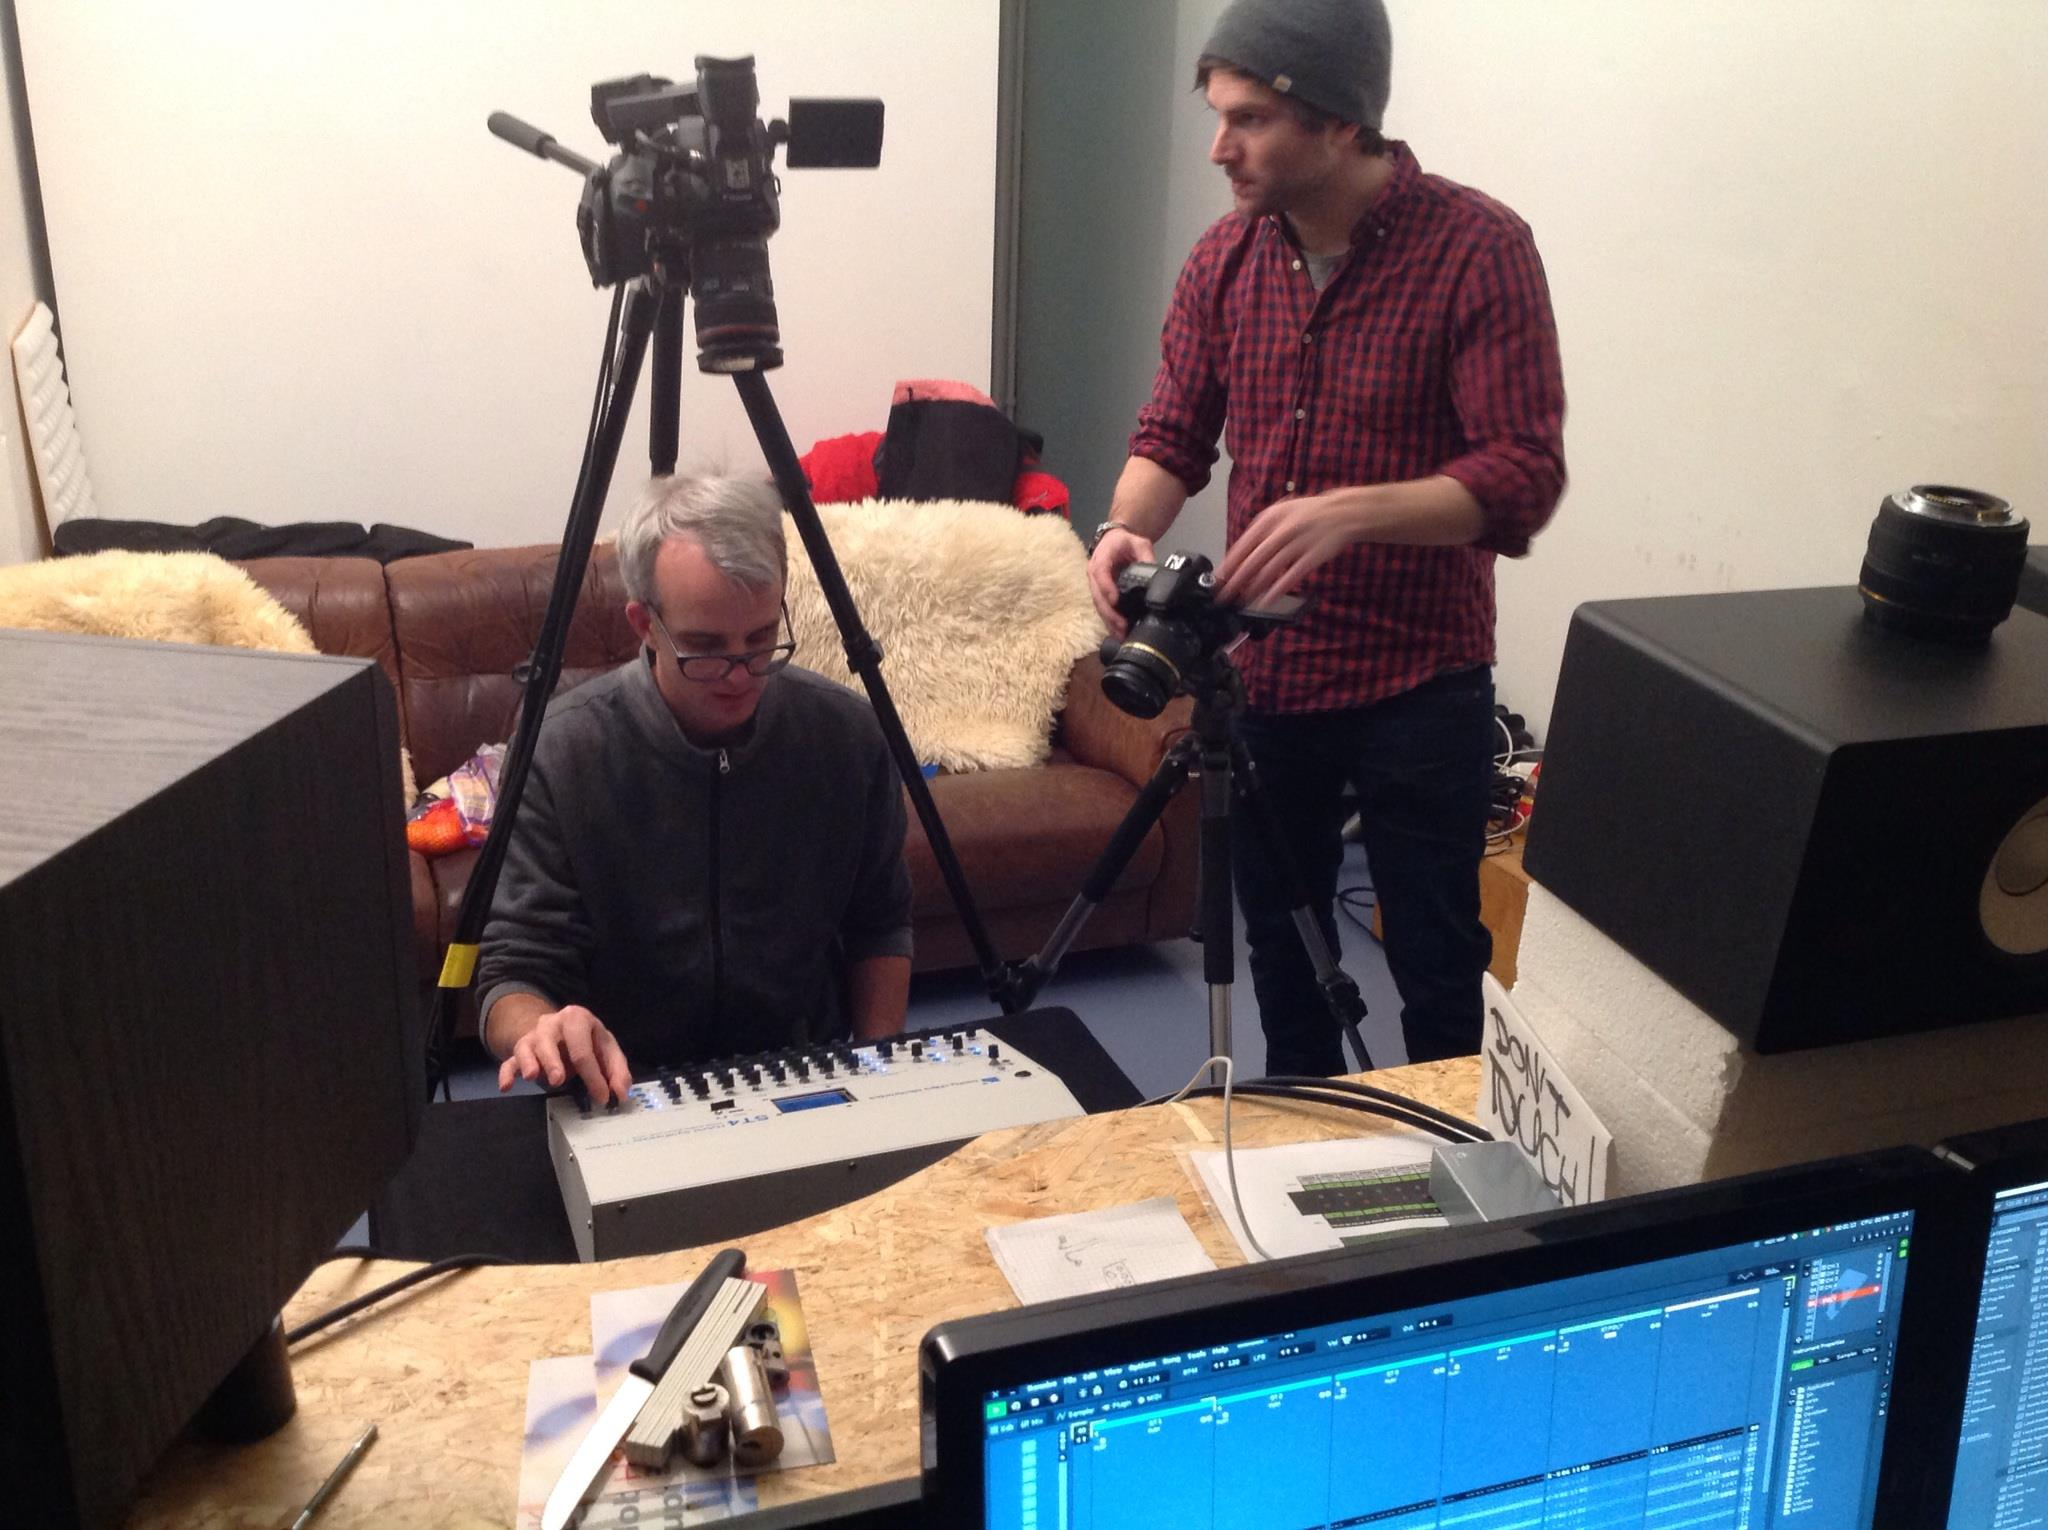 Studio demonstration of the ST4.